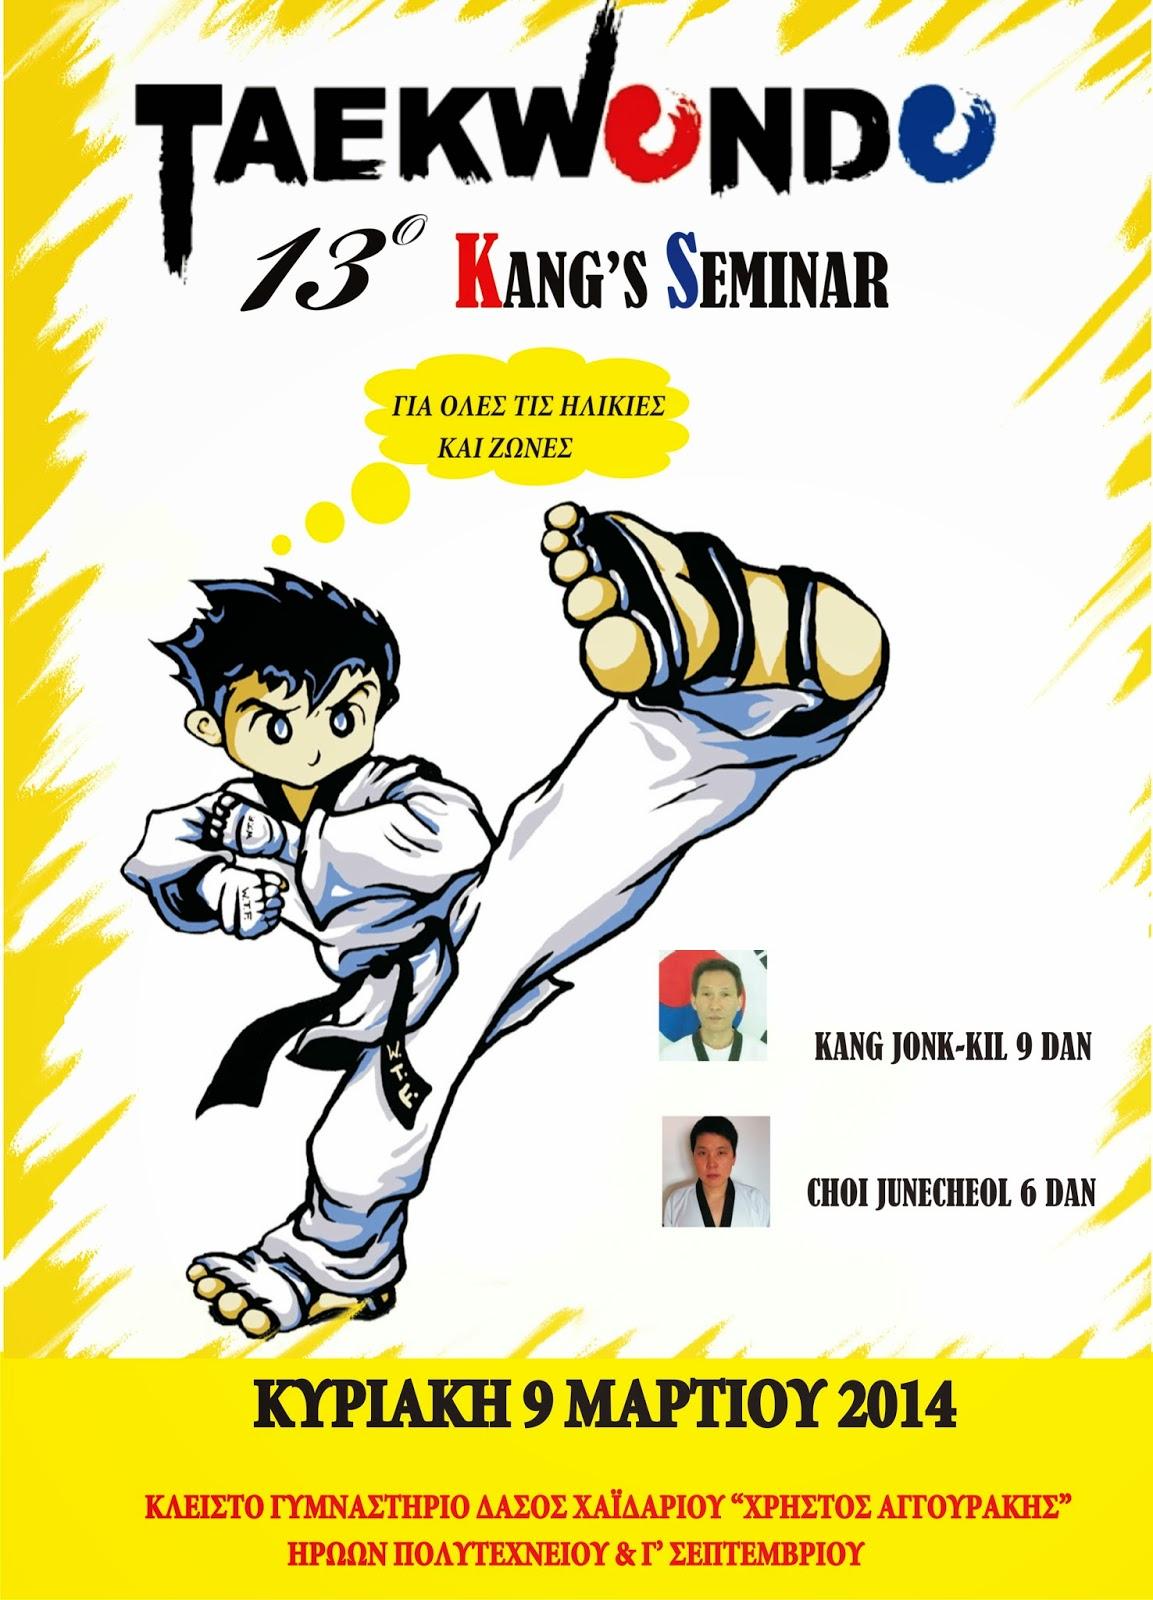 http://taekwondoclubgr.blogspot.gr/2014/03/13o-kangs-seminar.html